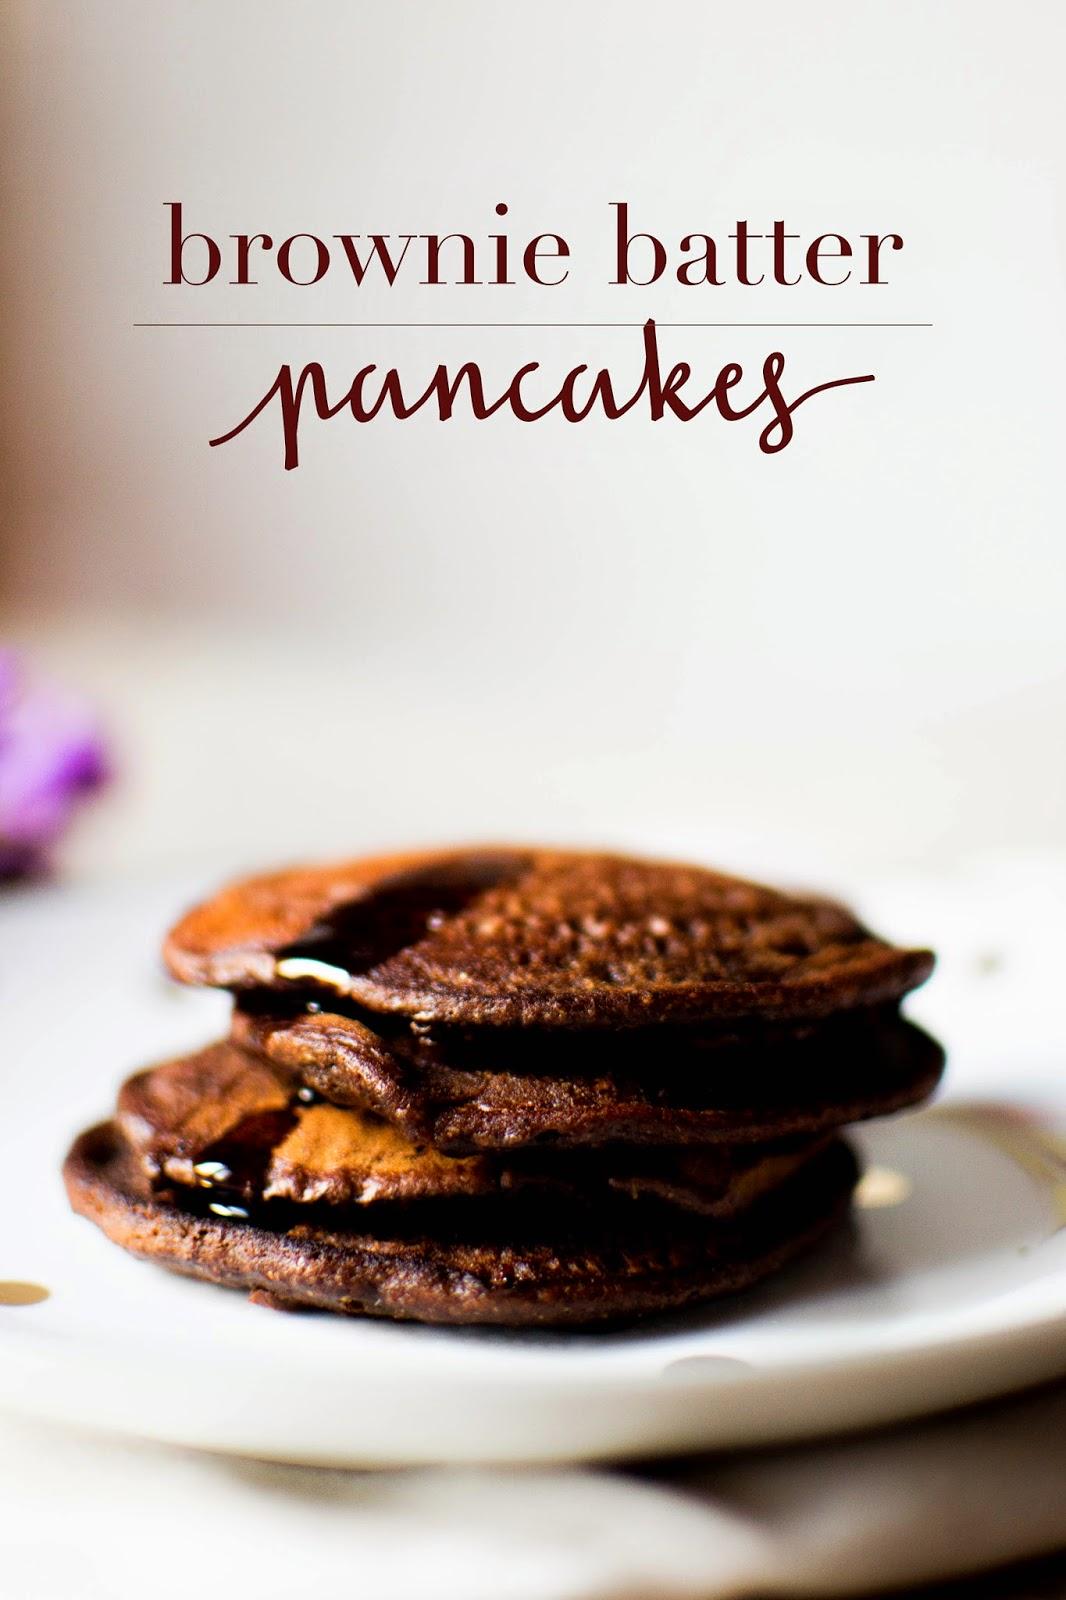 Healthy + Vegan Brownie Batter Pancakes • Miel Café